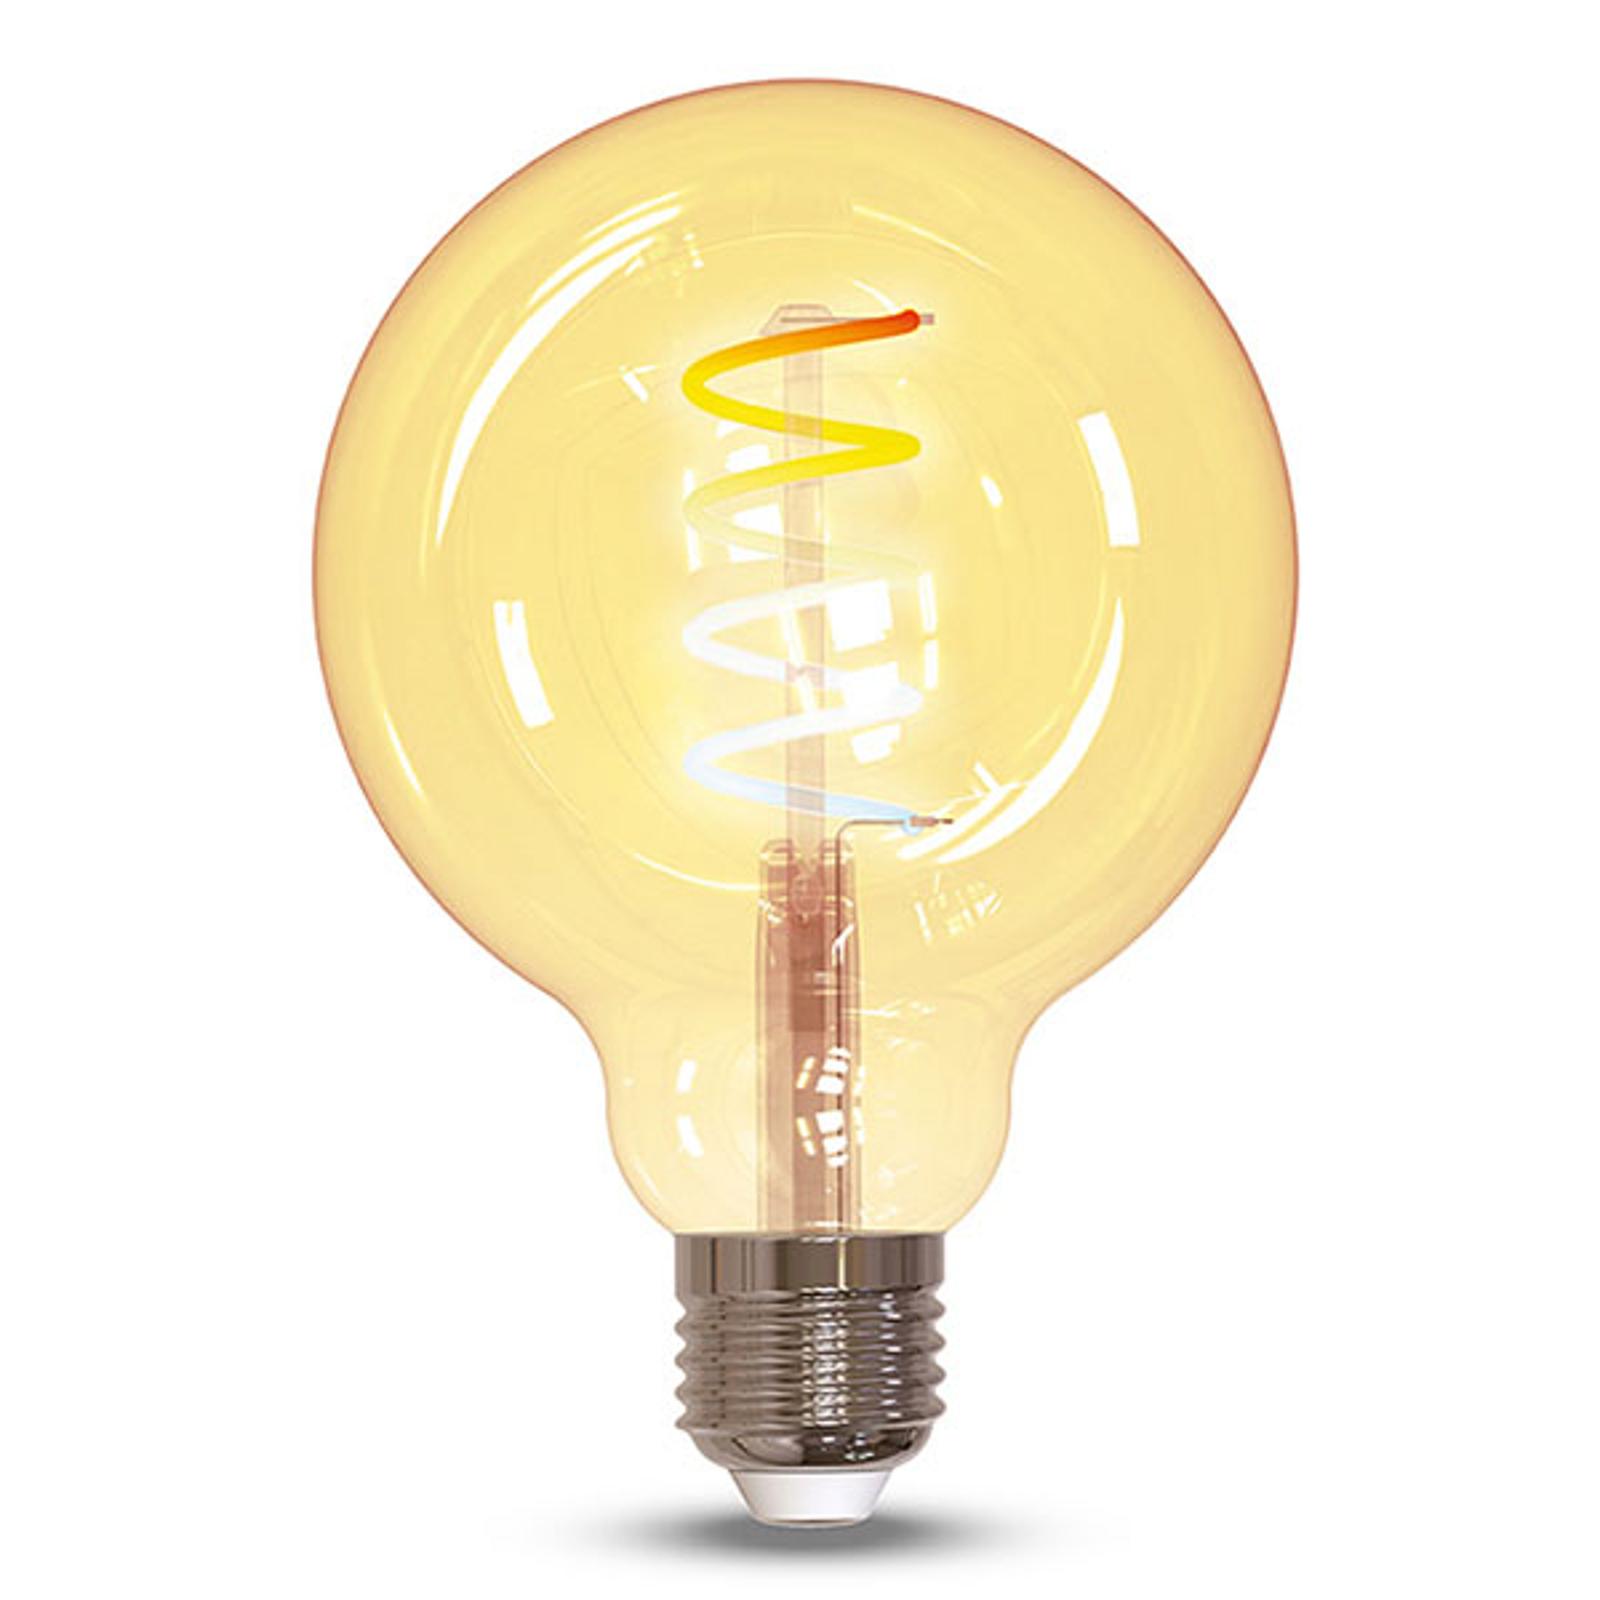 Müller Licht tint LED-globe G95 E27 5,5W kulta